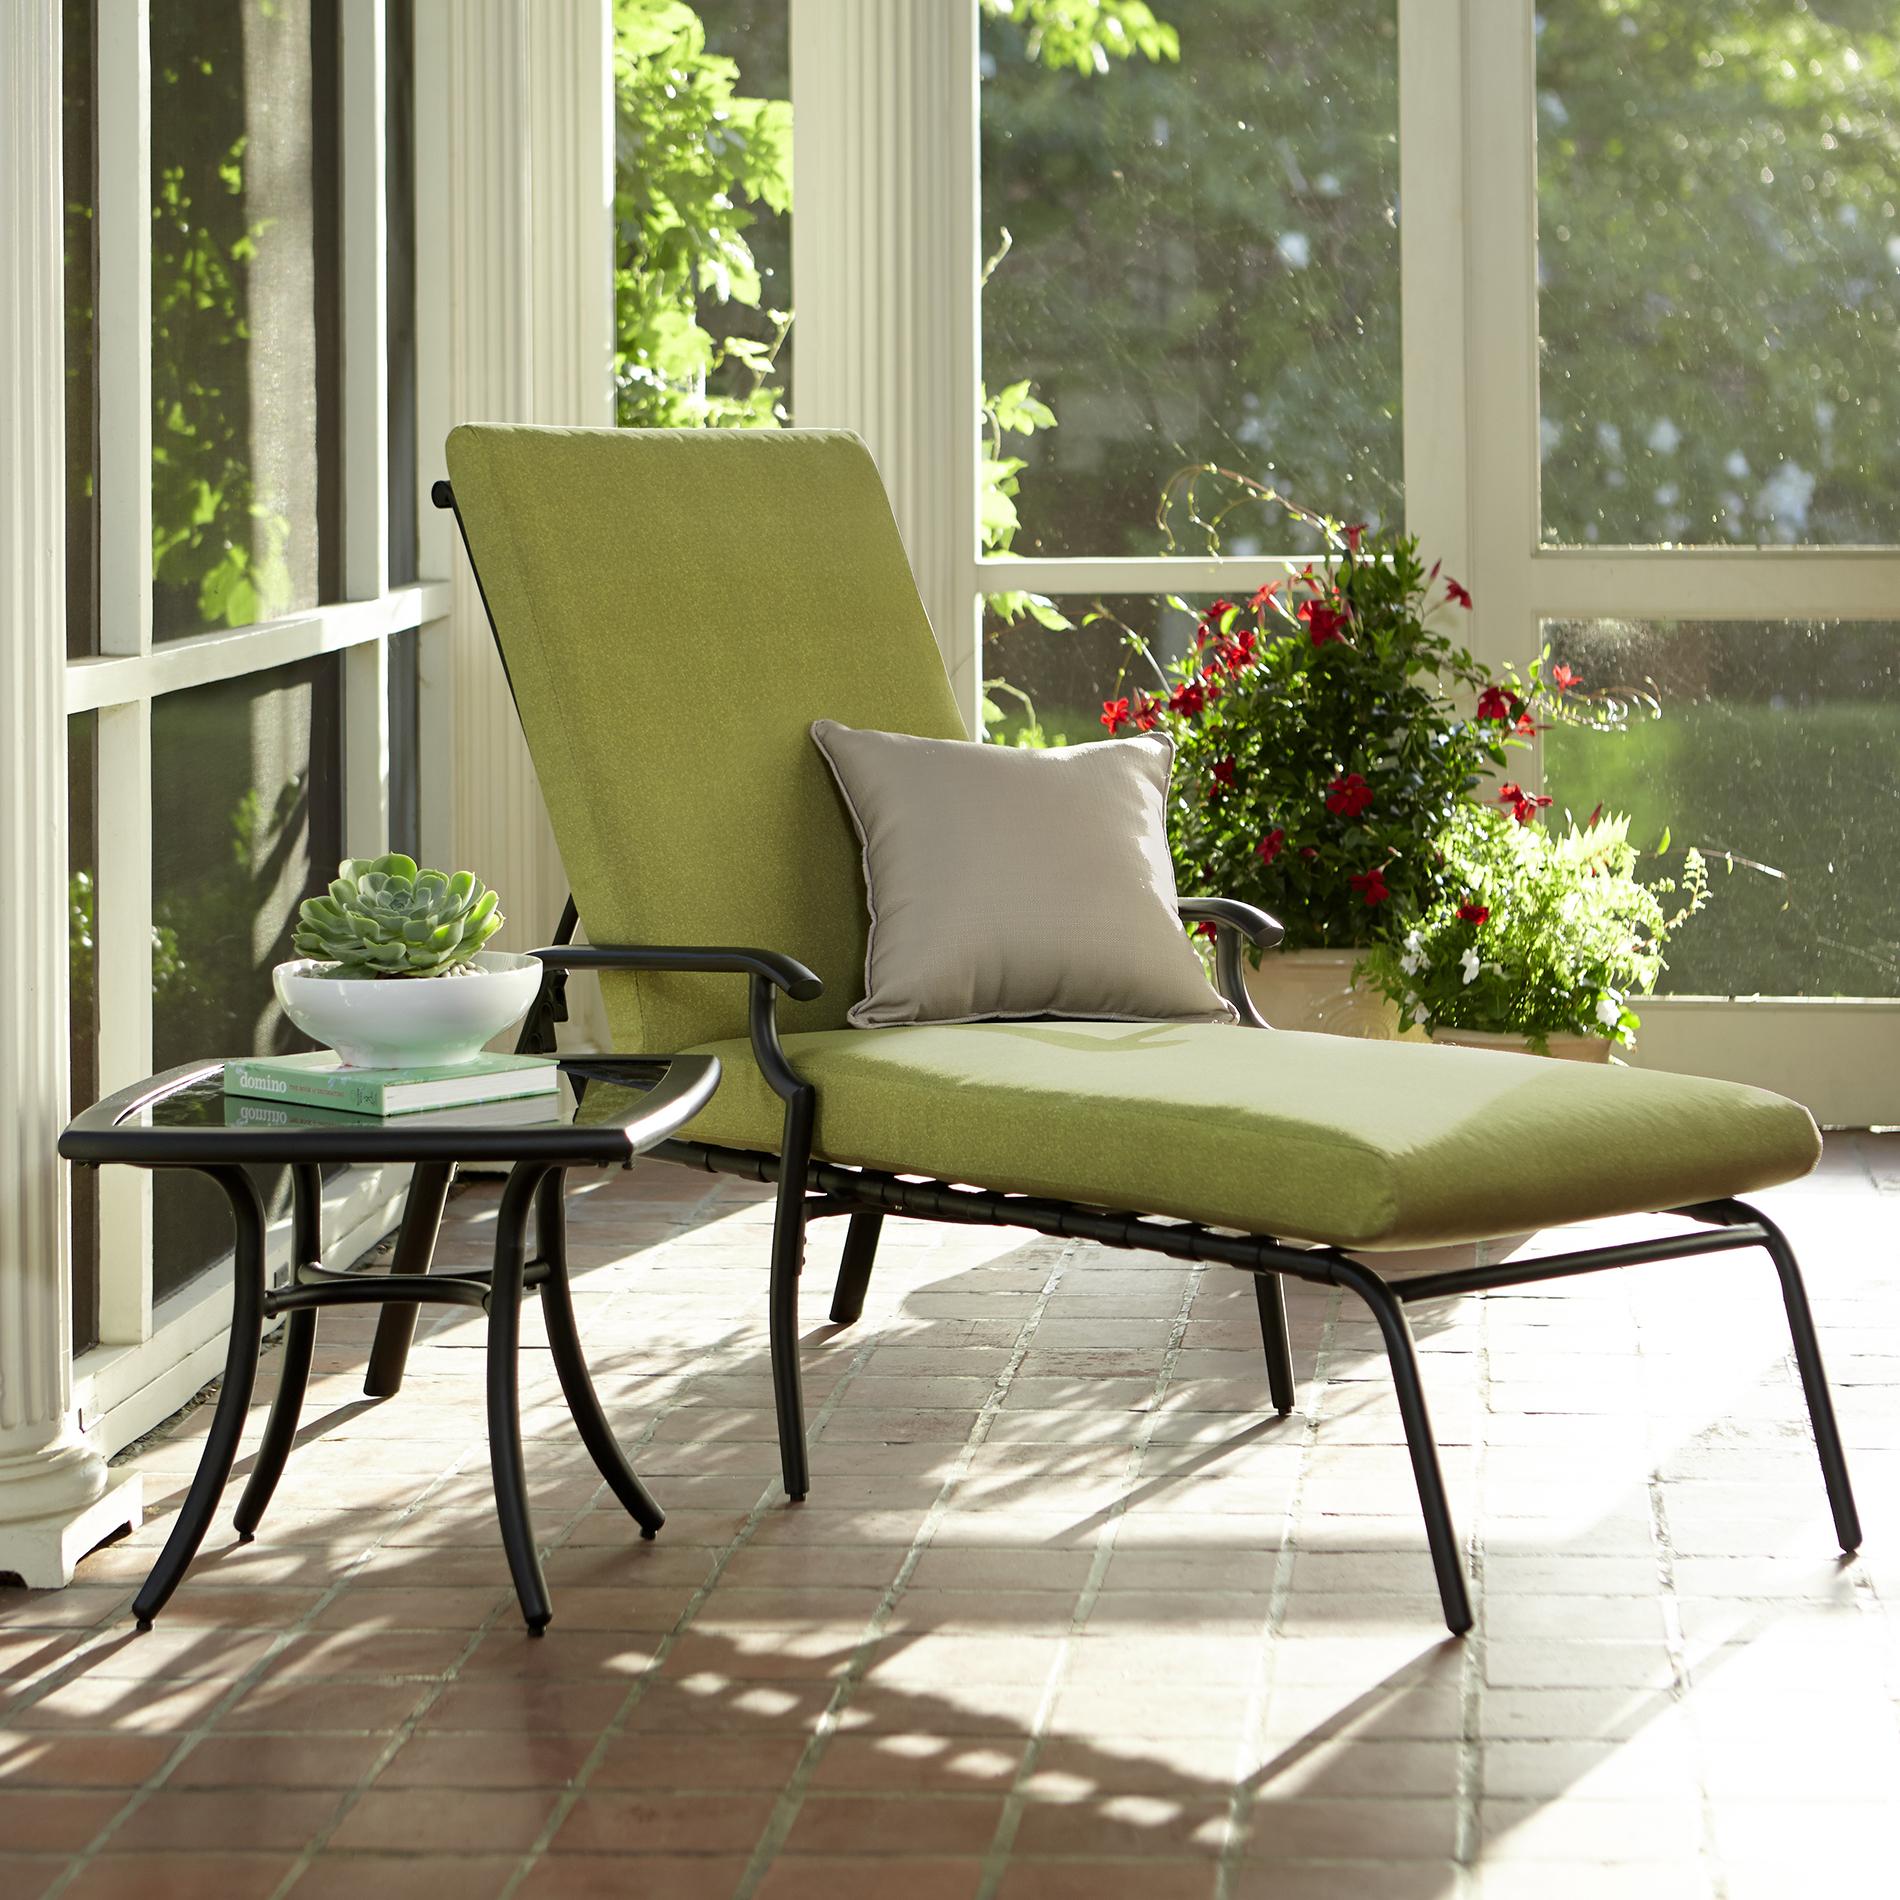 Garden Oasis Rockford Chaise Lounge Outdoor Living Patio